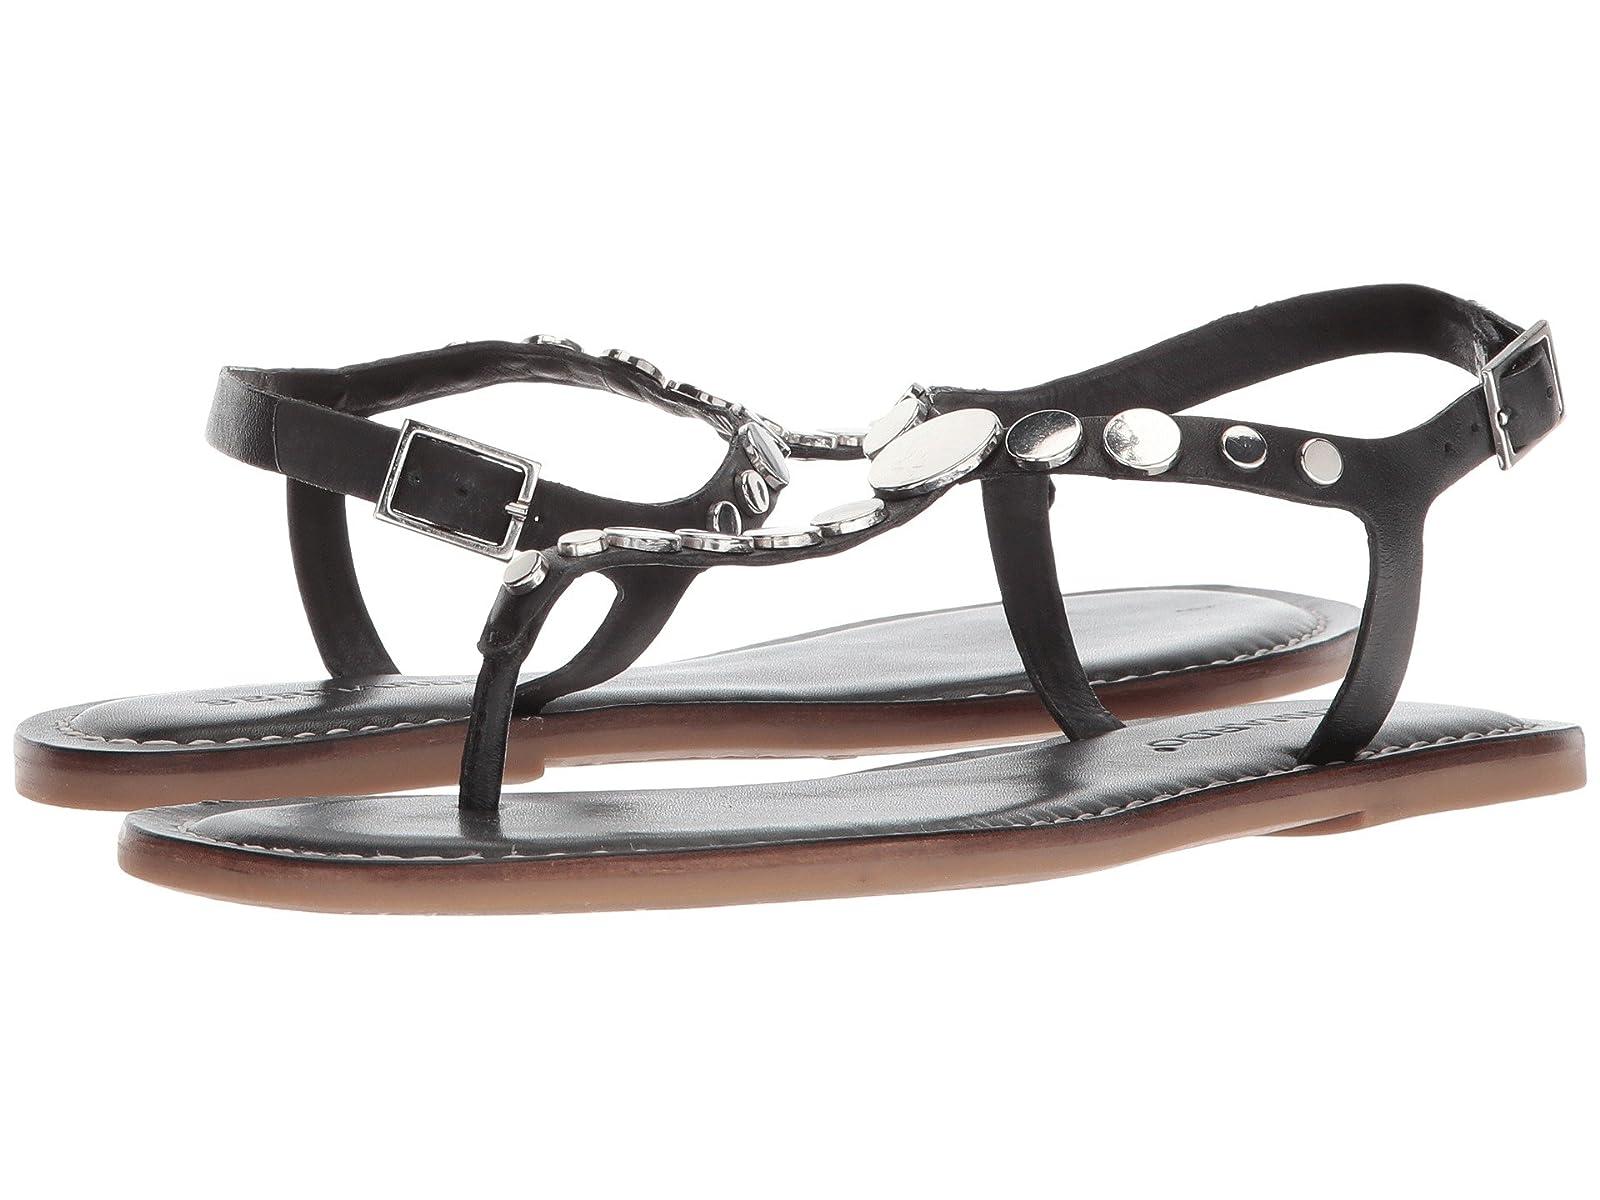 Bernardo MayComfortable and distinctive shoes